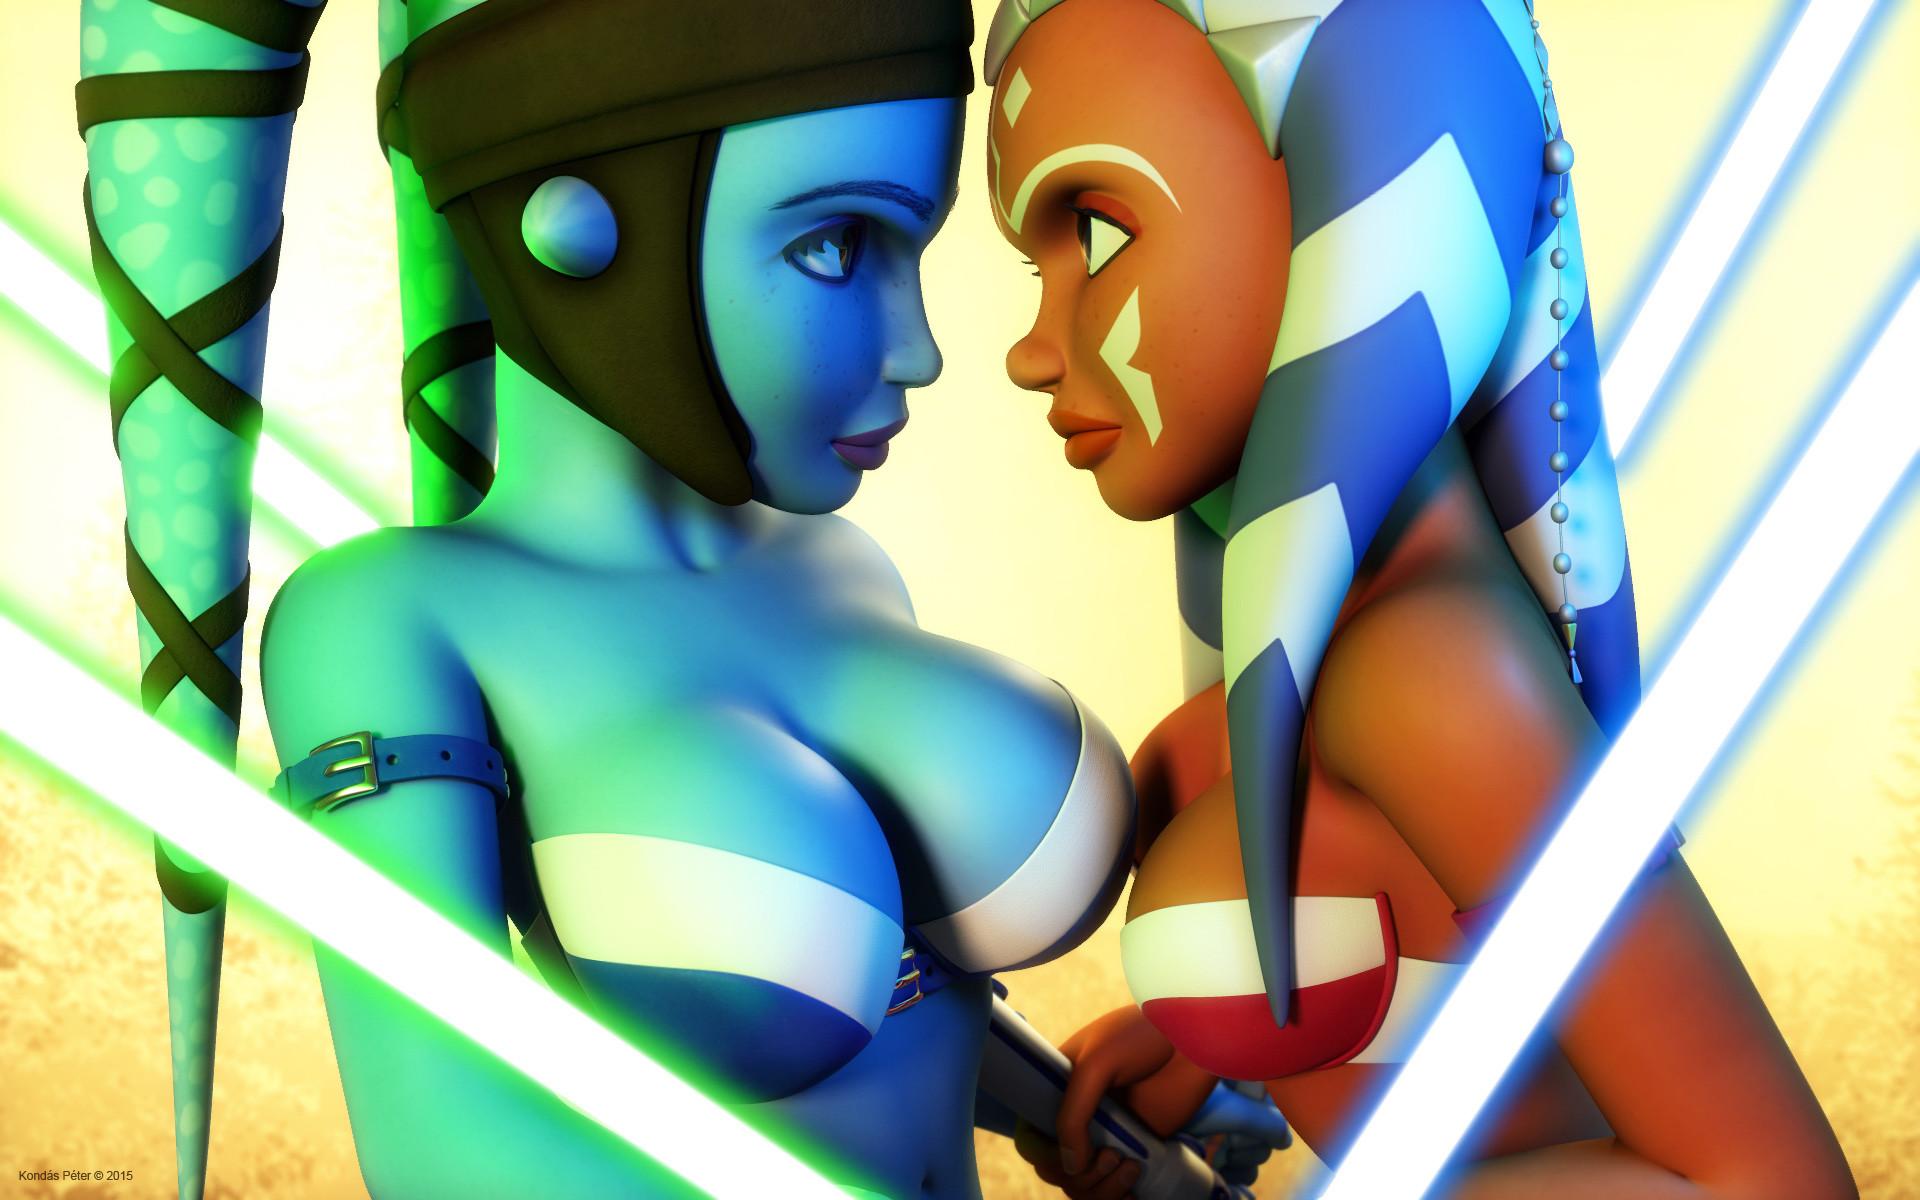 Star wars girl nackt naked porn star